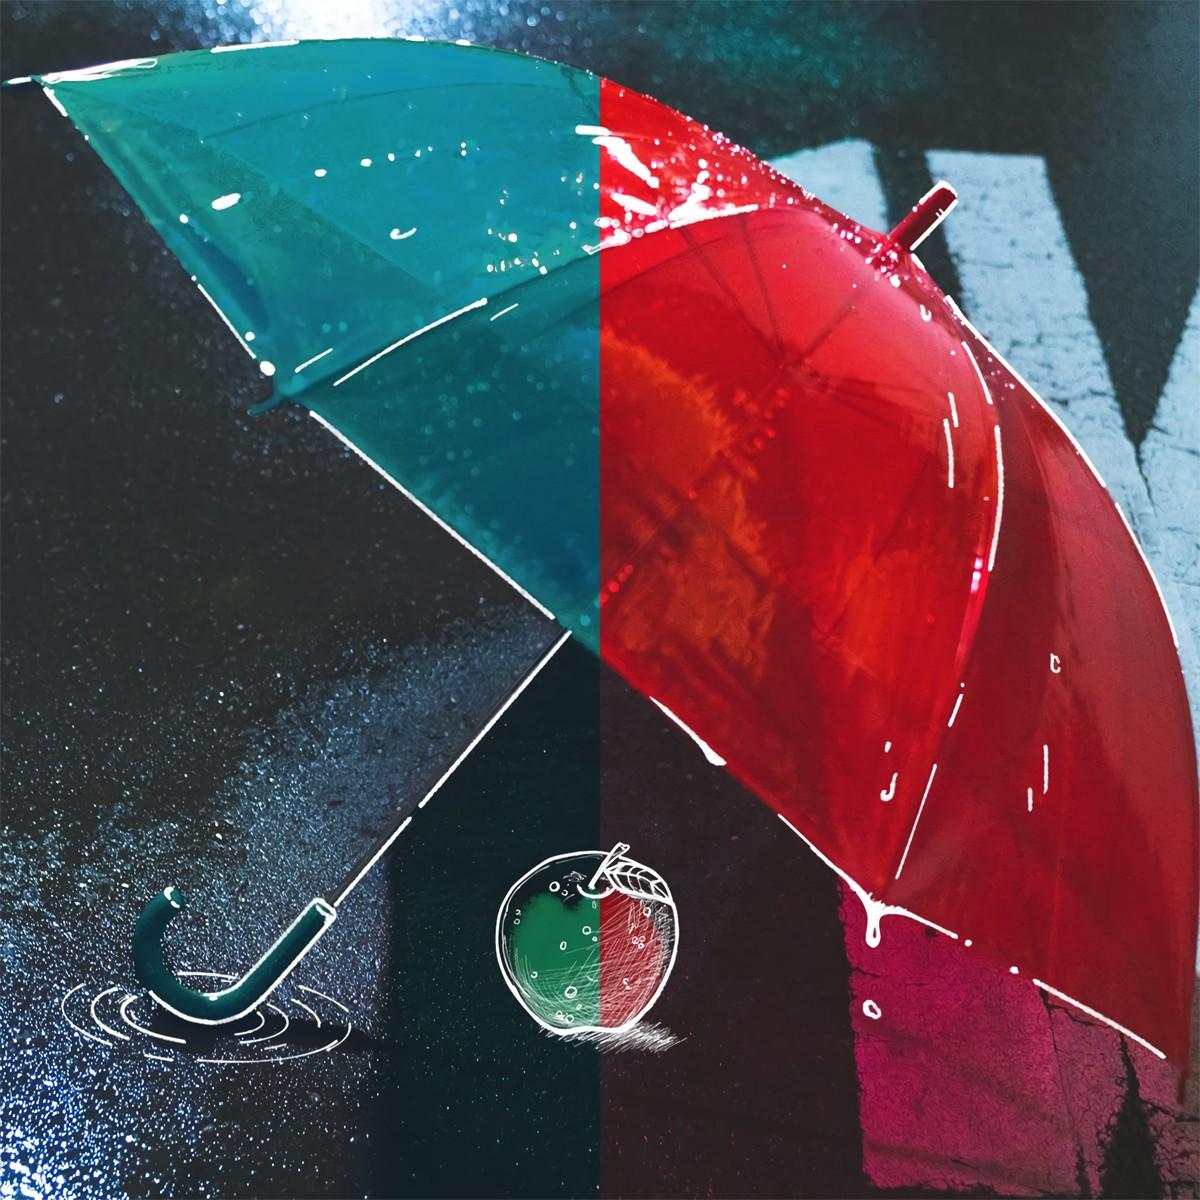 [Album] THE BINARY – jiu [FLAC / WEB] [2020.09.21]